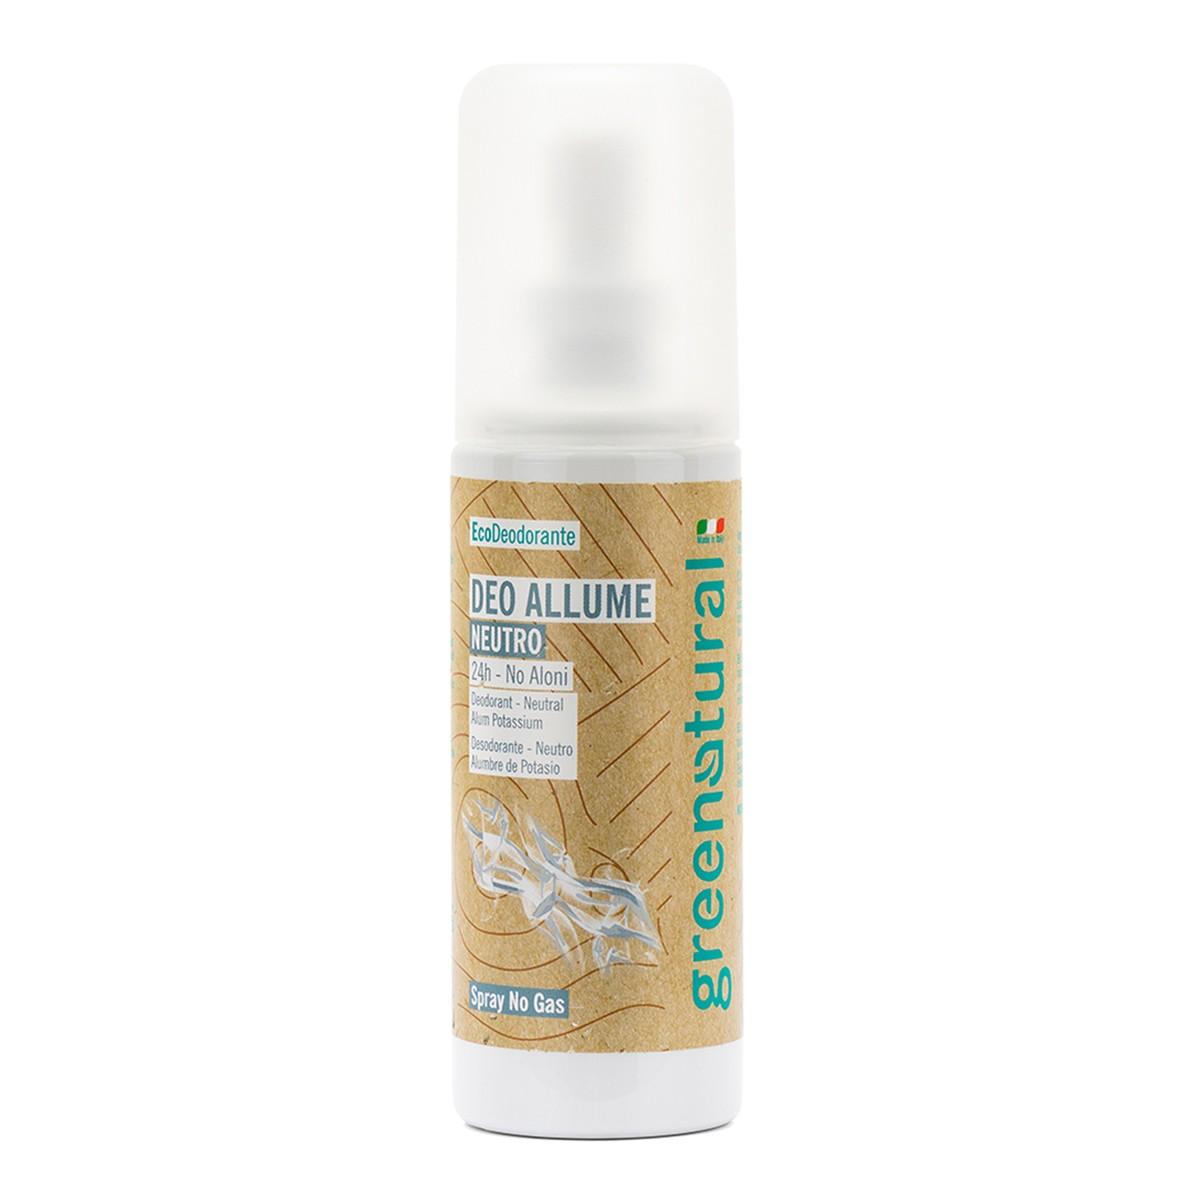 Eco Deodorante Allume Neutro